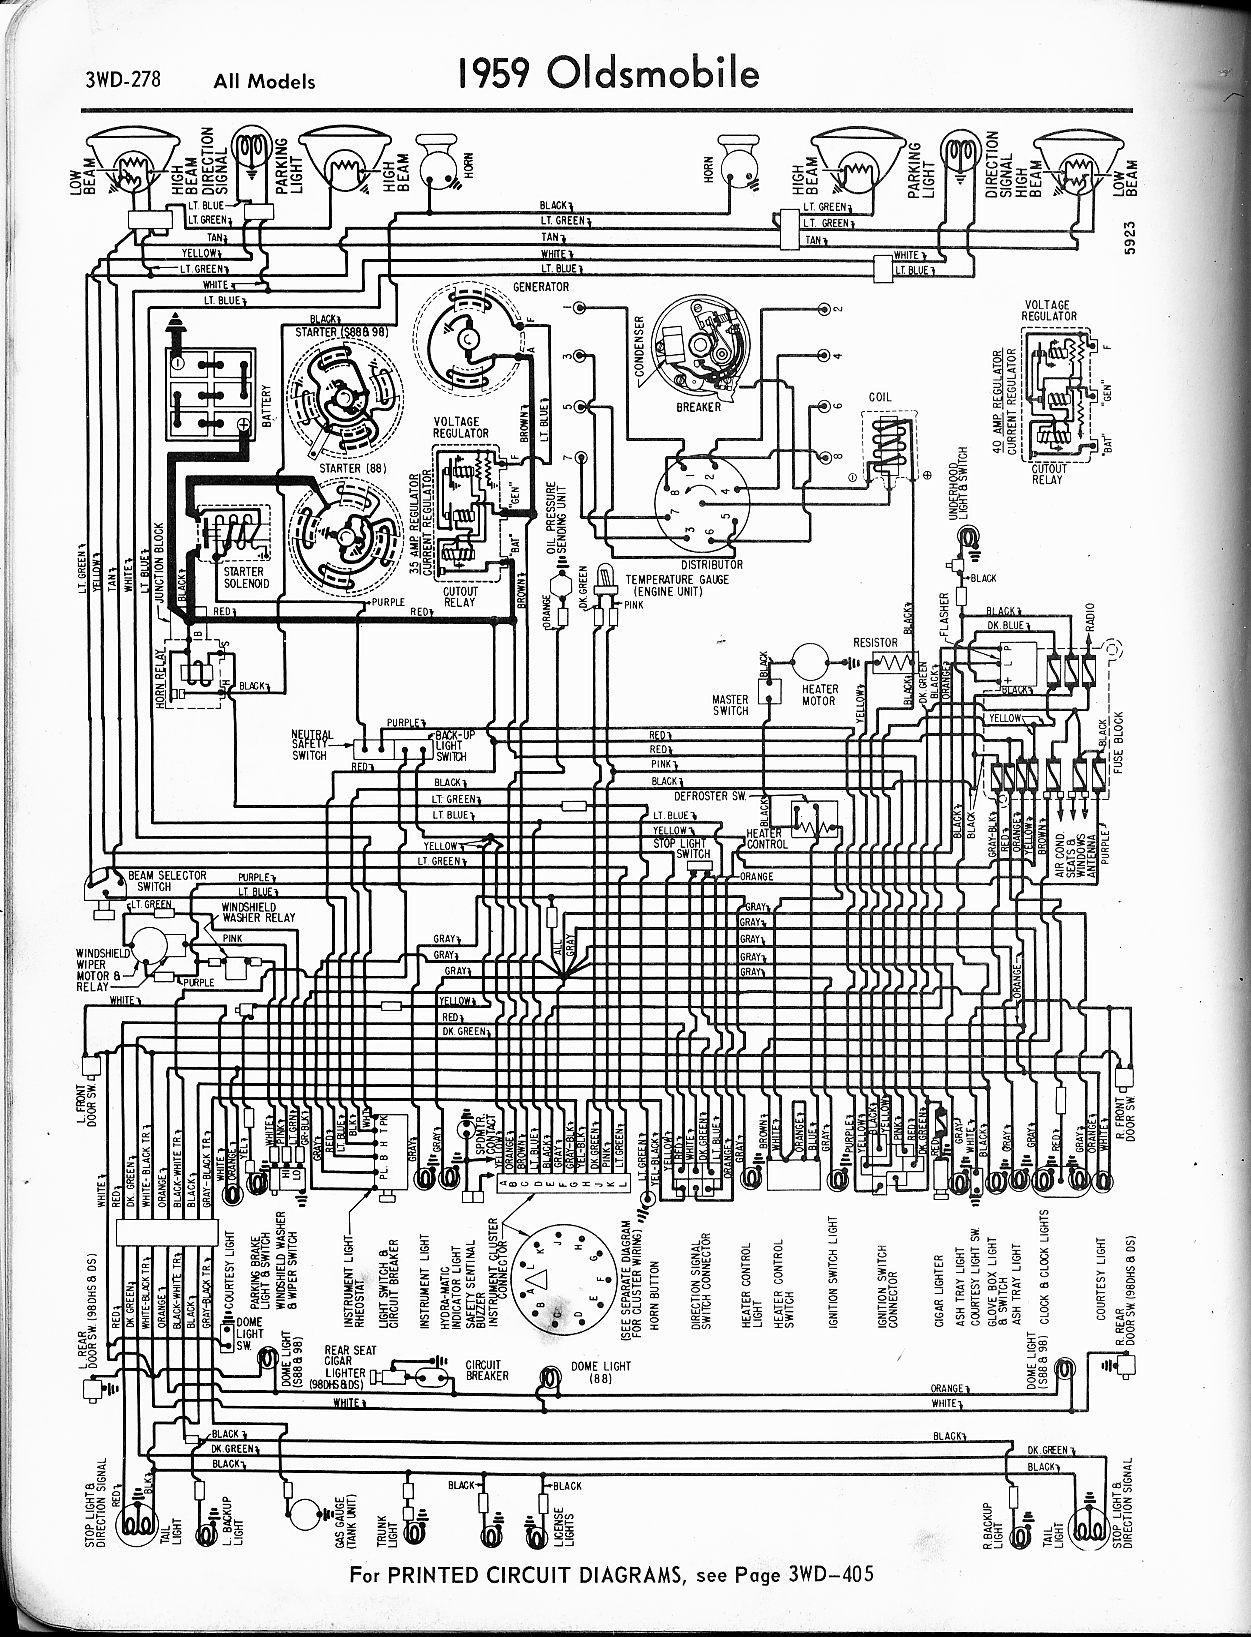 2001 Buick Century Wiring Diagram